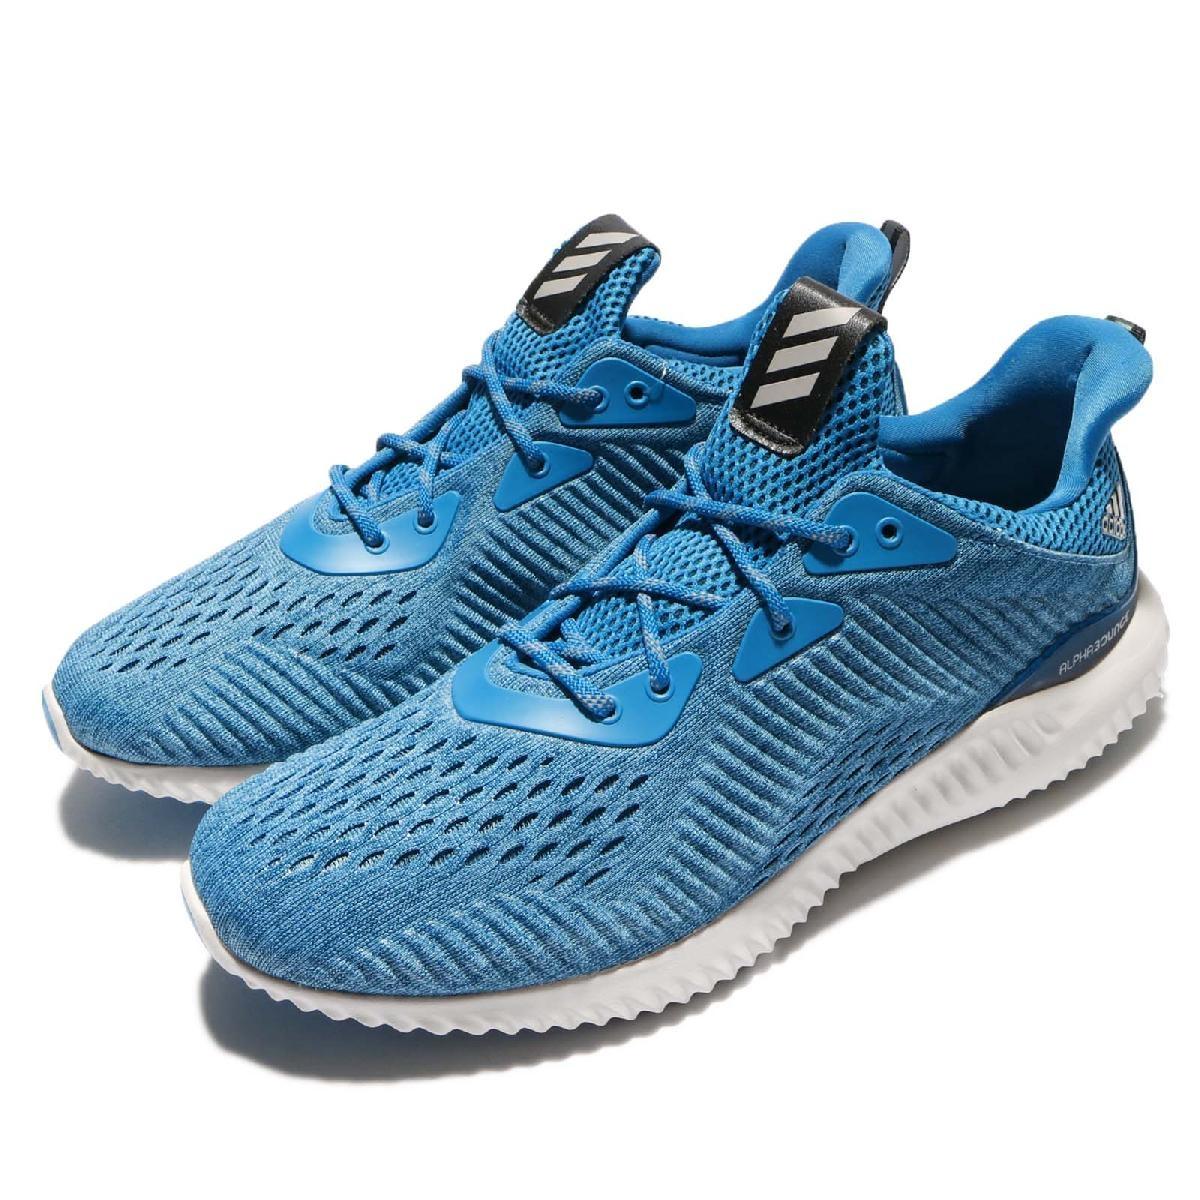 adidas 慢跑鞋 AlphaBOUNCE EM M 藍 灰 鯊魚腮 路跑 運動鞋 男鞋【PUMP306】 BY3846